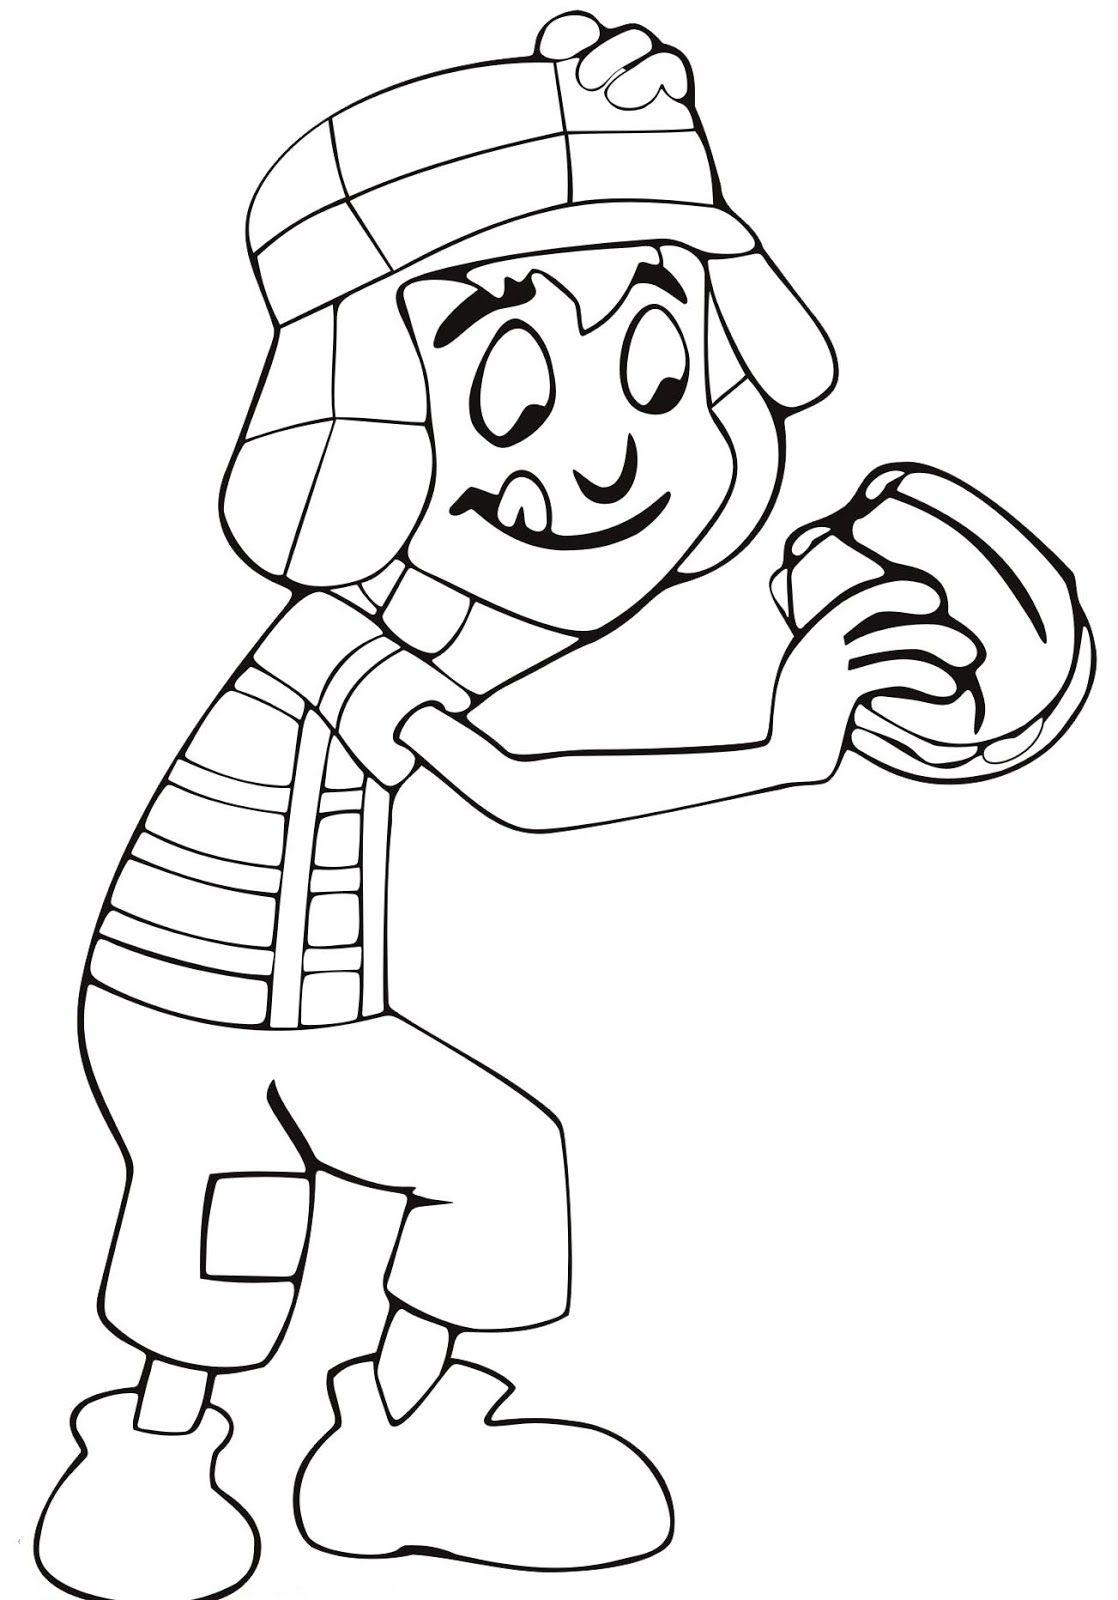 Dibujos Para Pintar Del Chavo Del 8 Animado Chavo Art